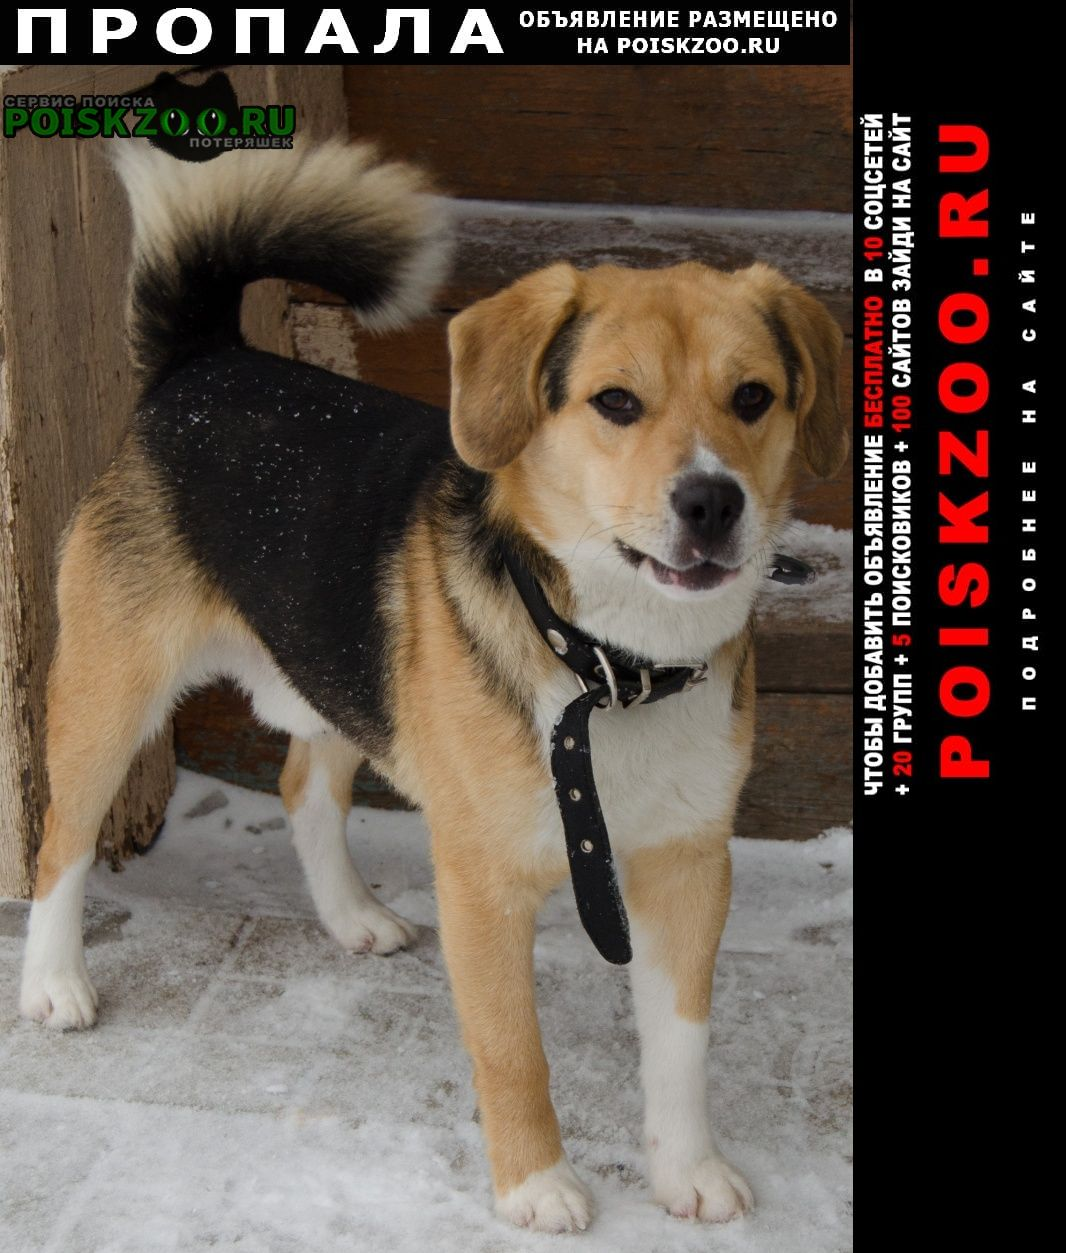 Пенза Пропала собака кобель любимая собака.бигль.кличка лаки